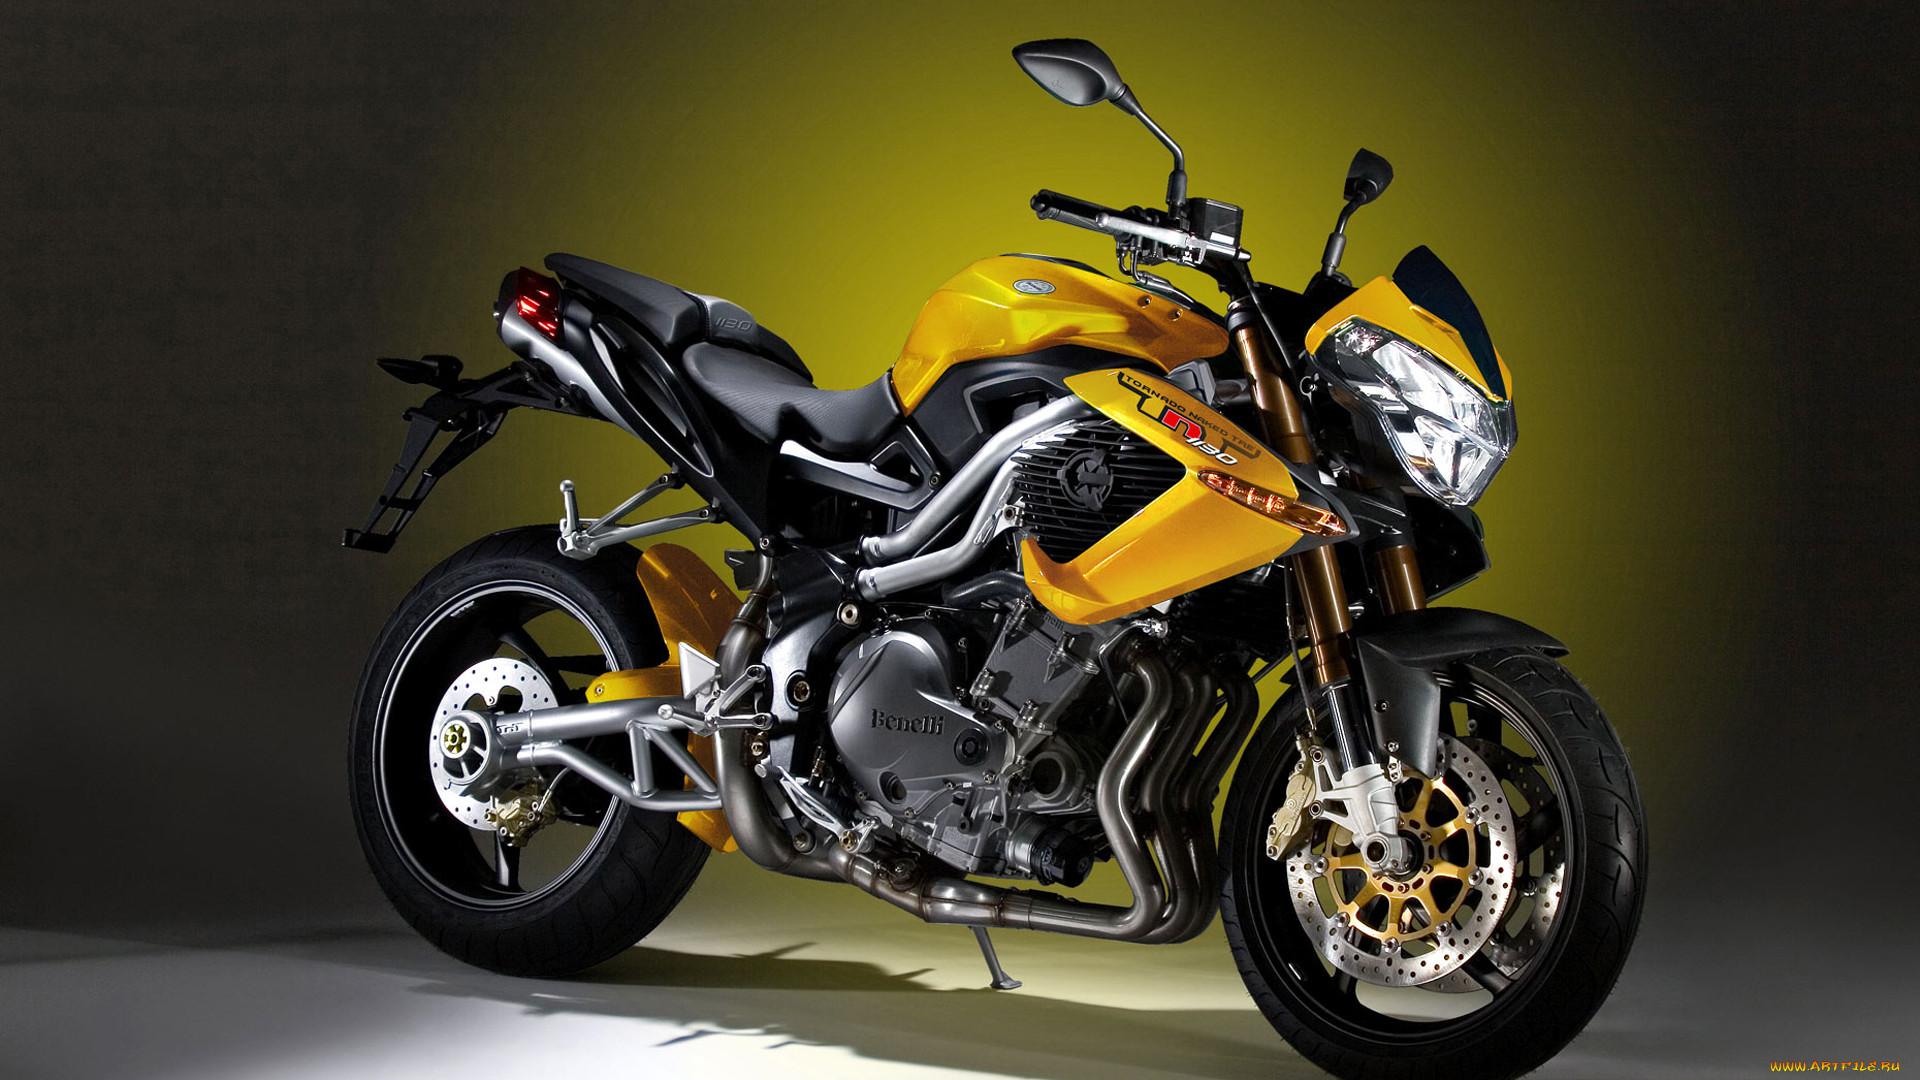 этом мотоциклы желтые картинки этого, взрослое